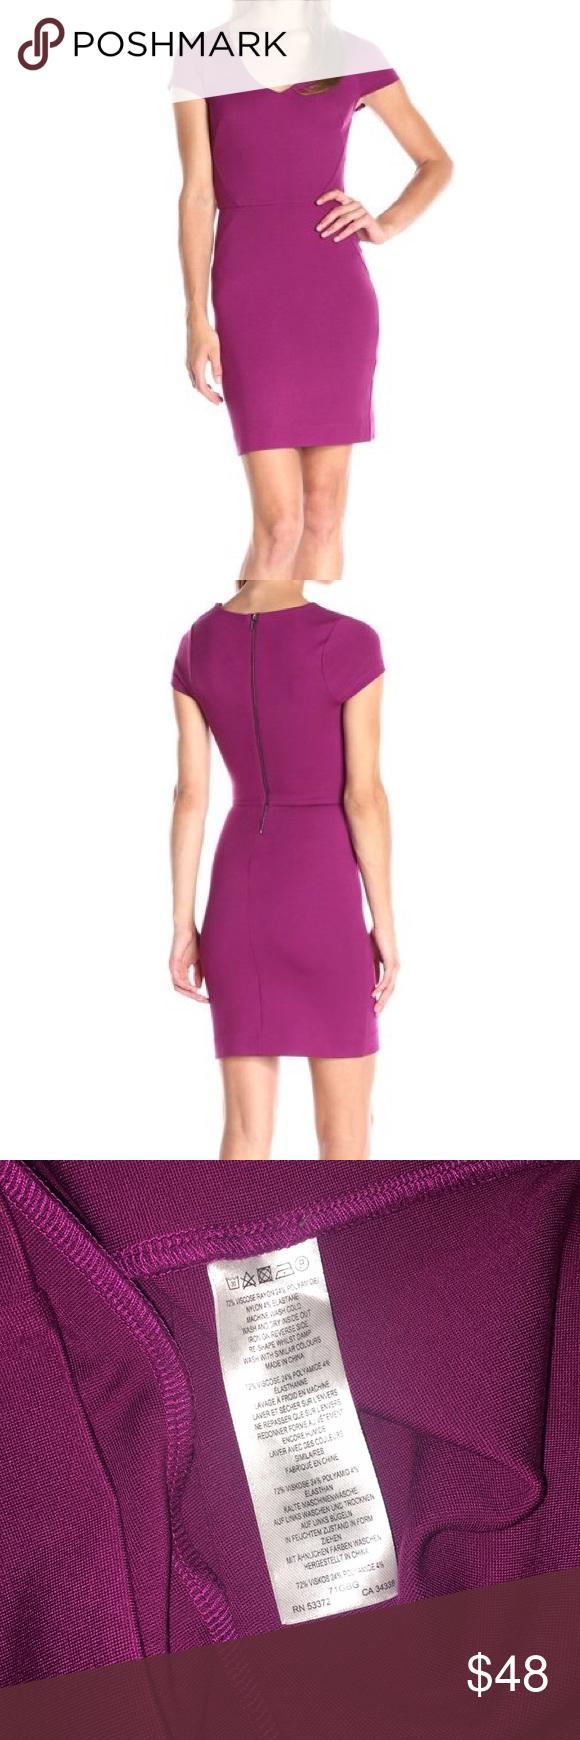 Nwt French Connection Magenta Purple V Neck Dress V Neck Dress Clothes Design Dresses [ 1740 x 580 Pixel ]